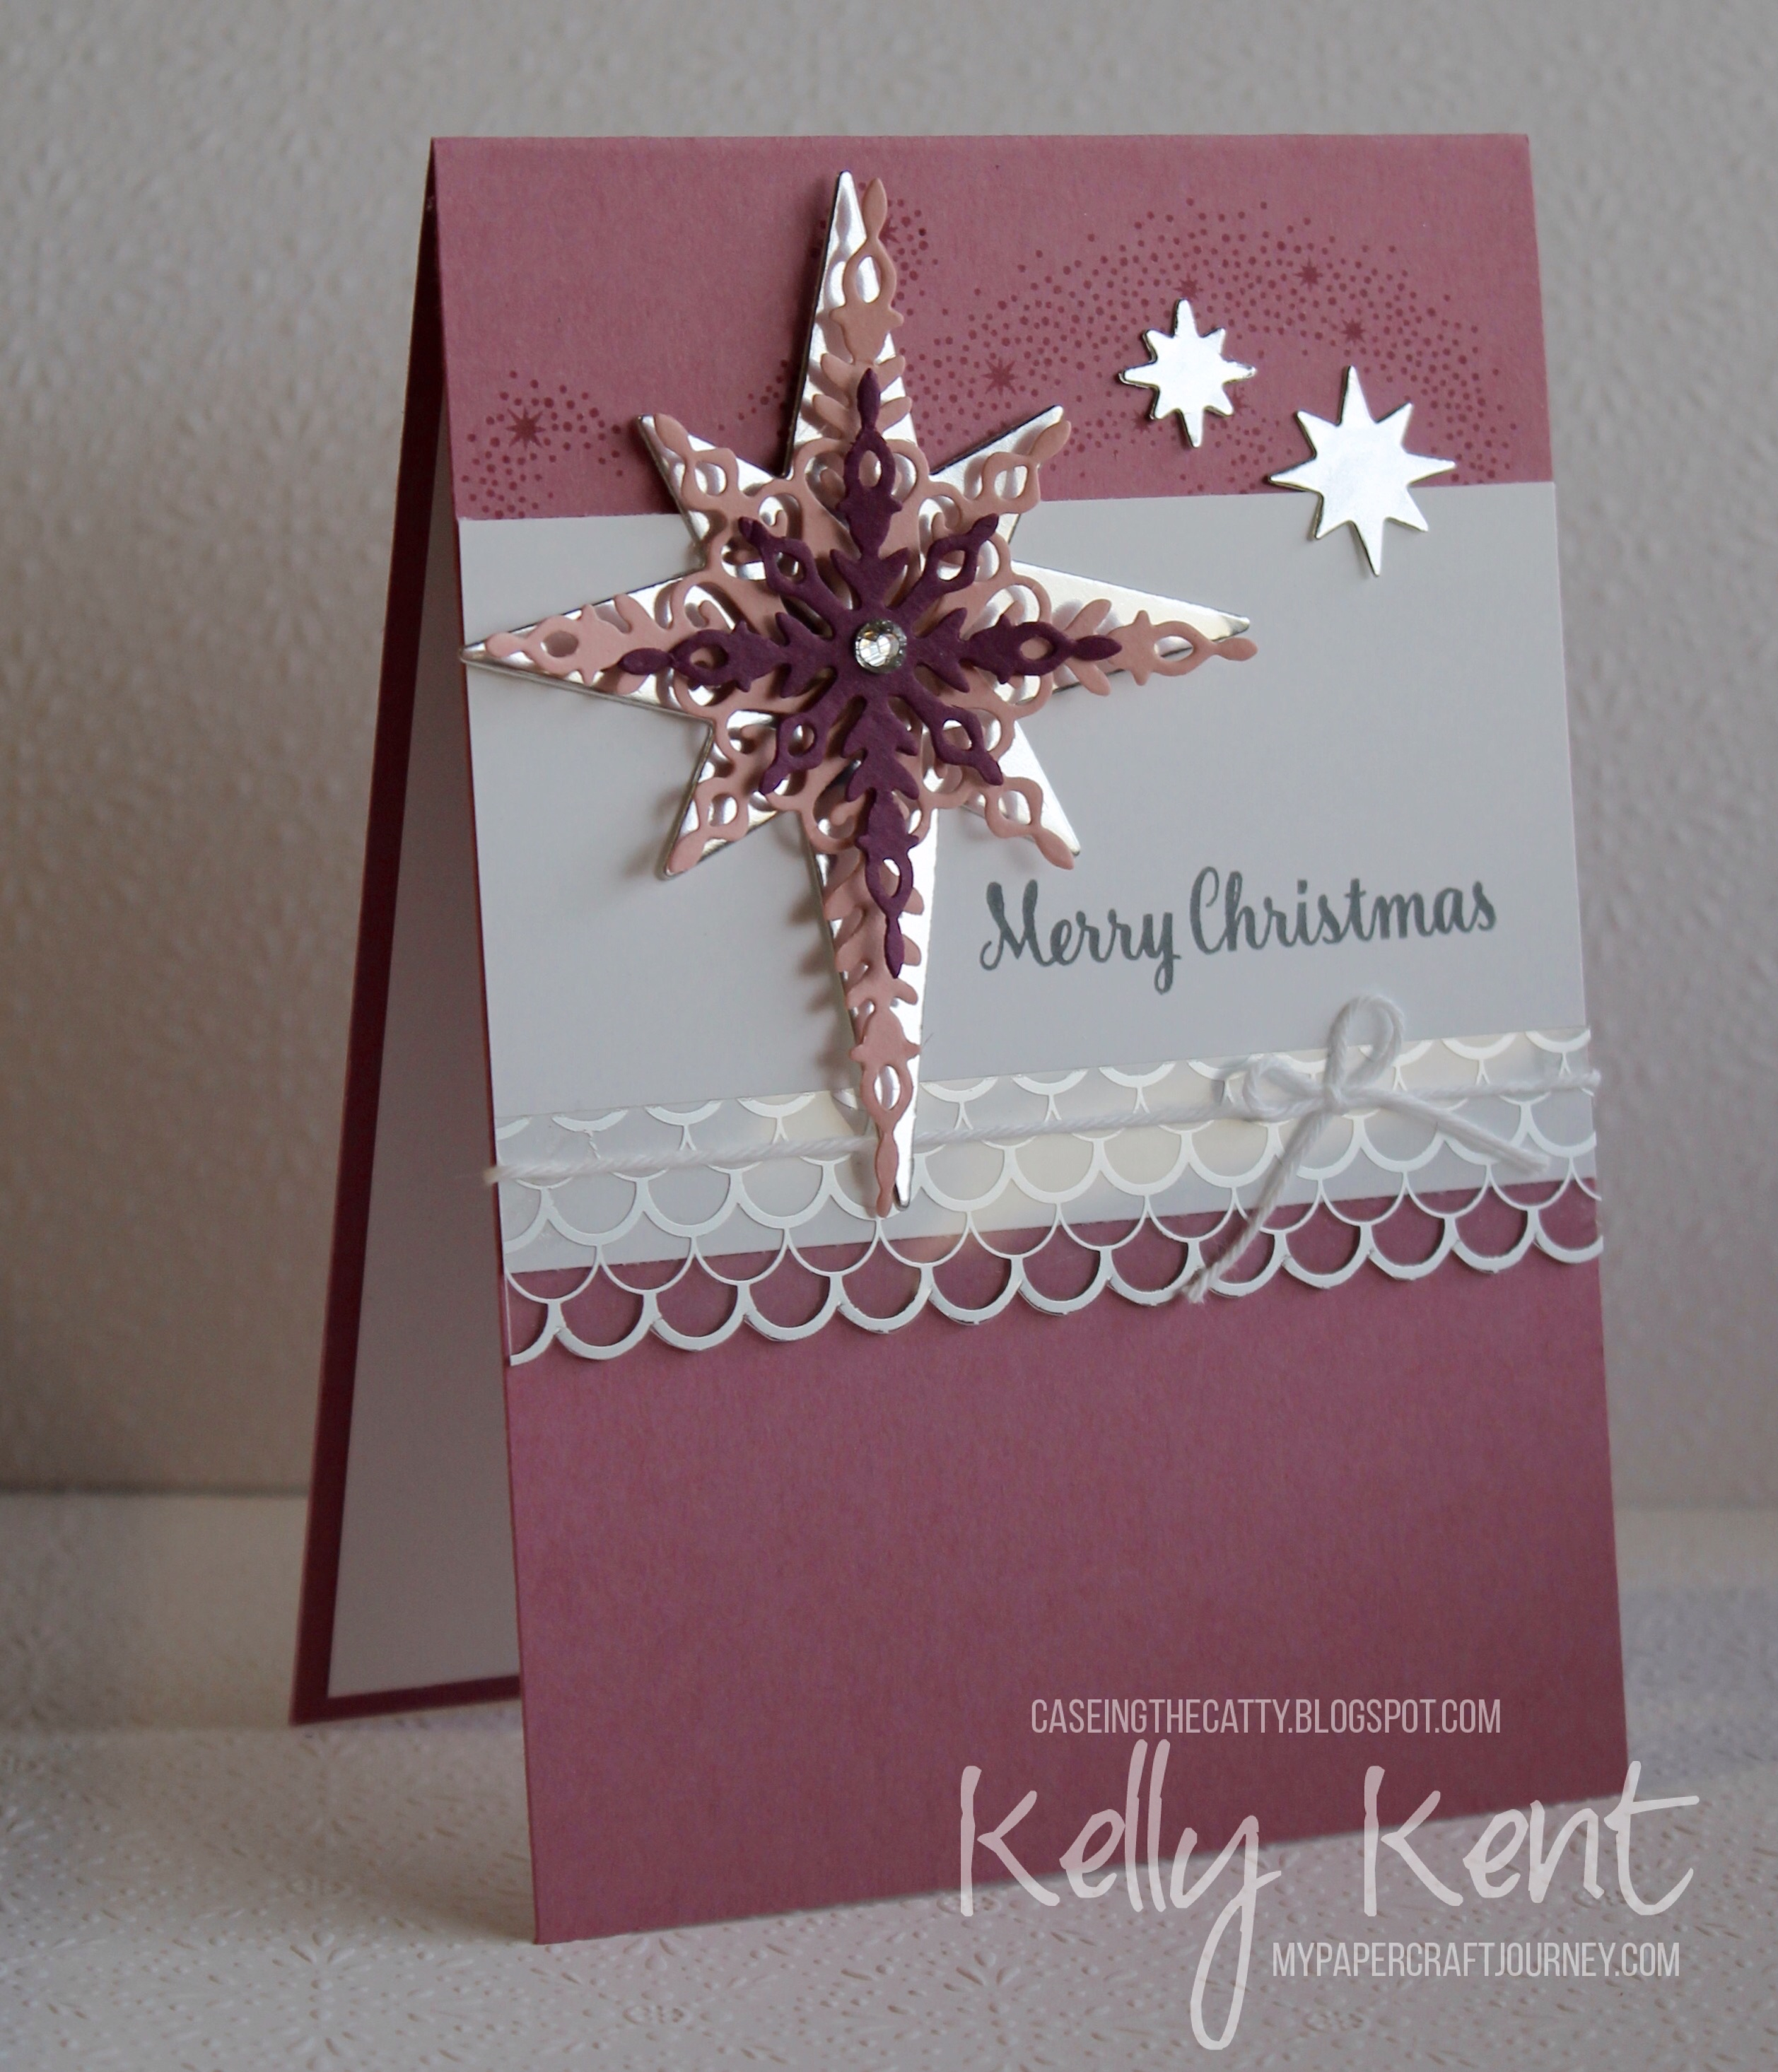 CASEing the Catty #96 - Big Shot. Starlight Thinlits & Star of Light stamp set - Sweet Sugarplum. Kelly Kent - mypapercraftjourney.com.